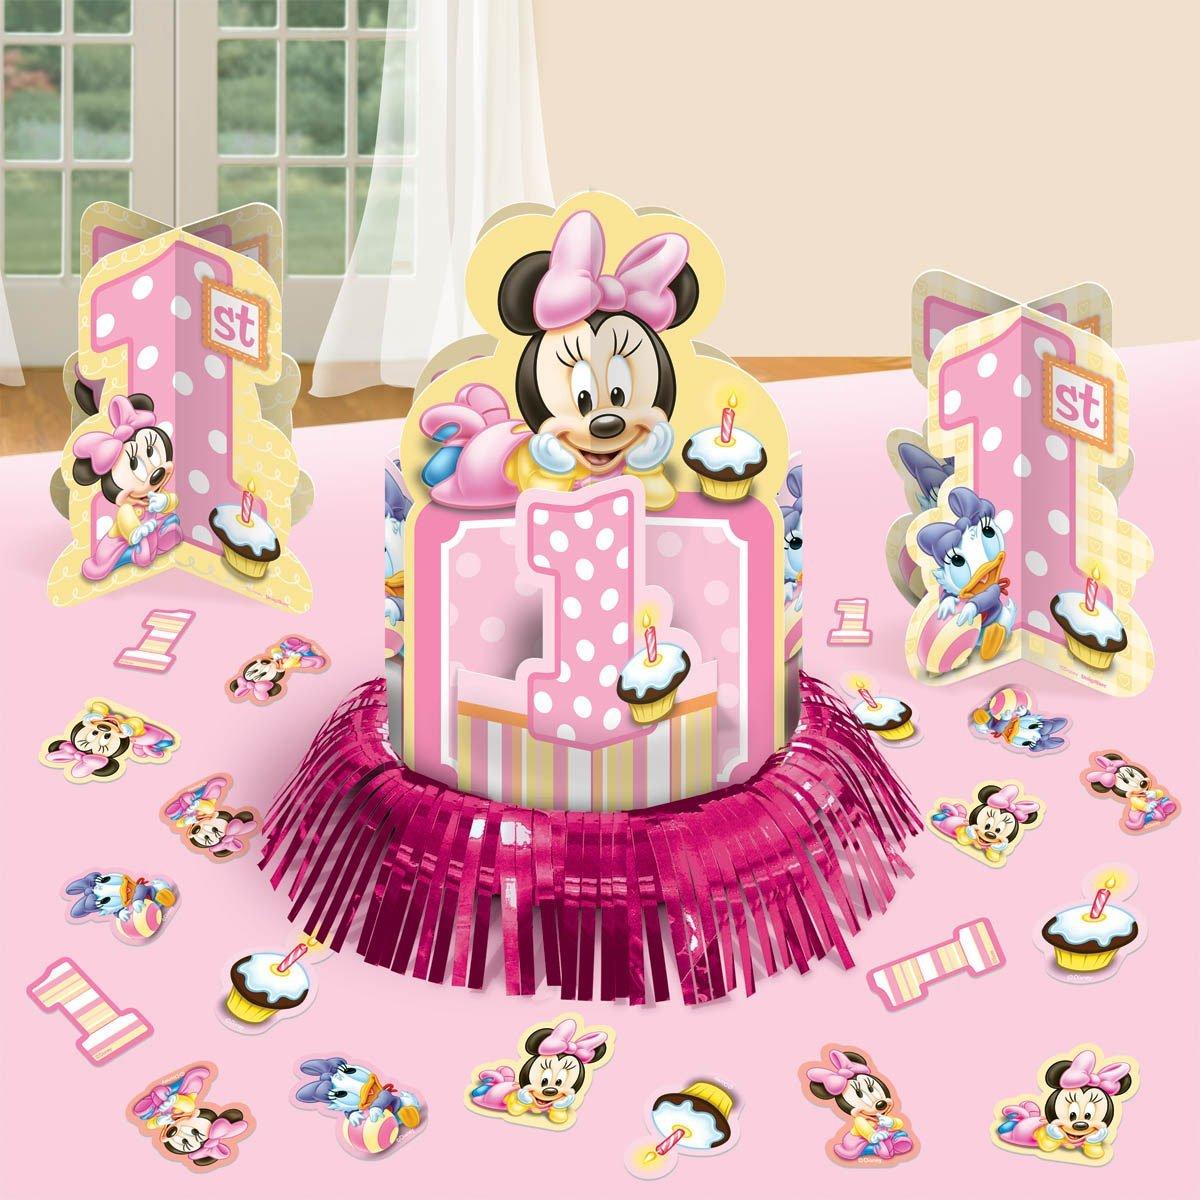 Minnies 1st Birthday Table Decorating Kit